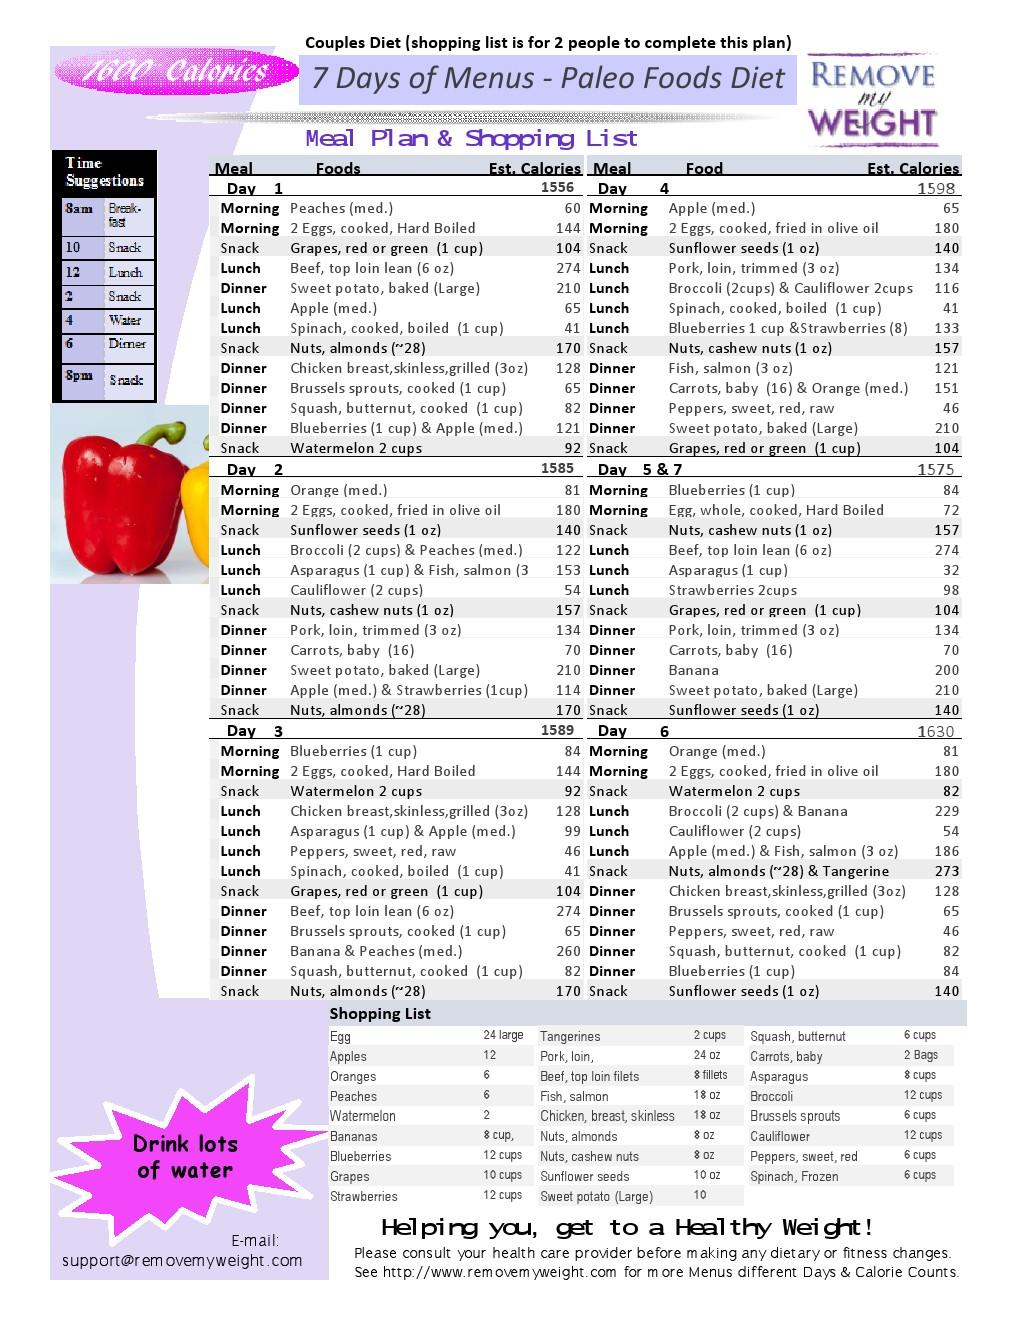 1600 Calorie Paleo Diet 7 Day Menu Plan For Couples